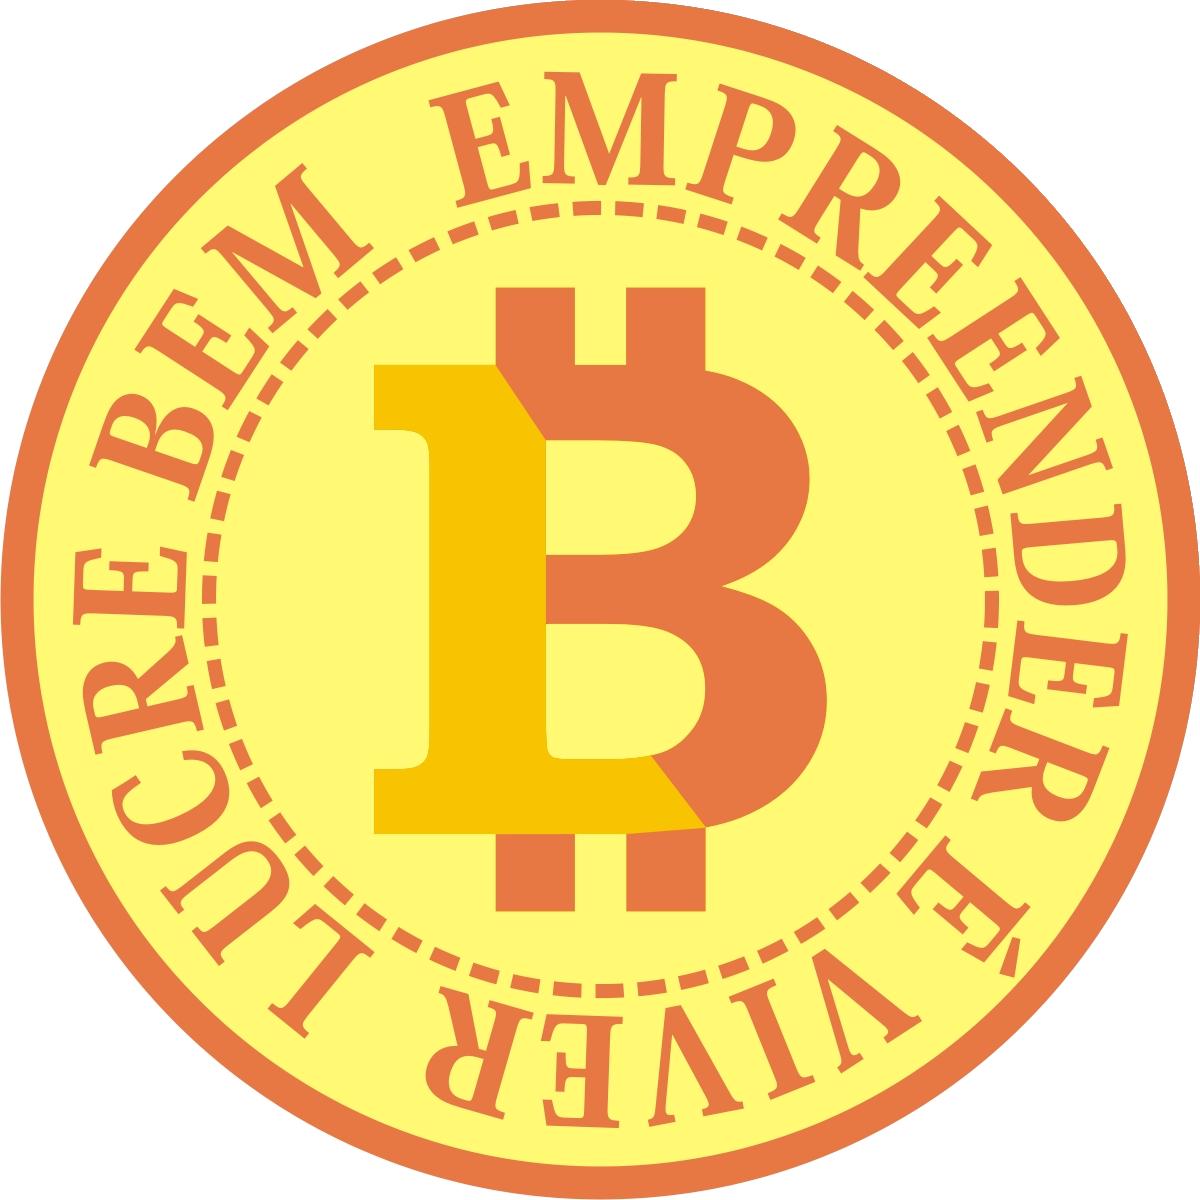 Logofinal amostra.fw